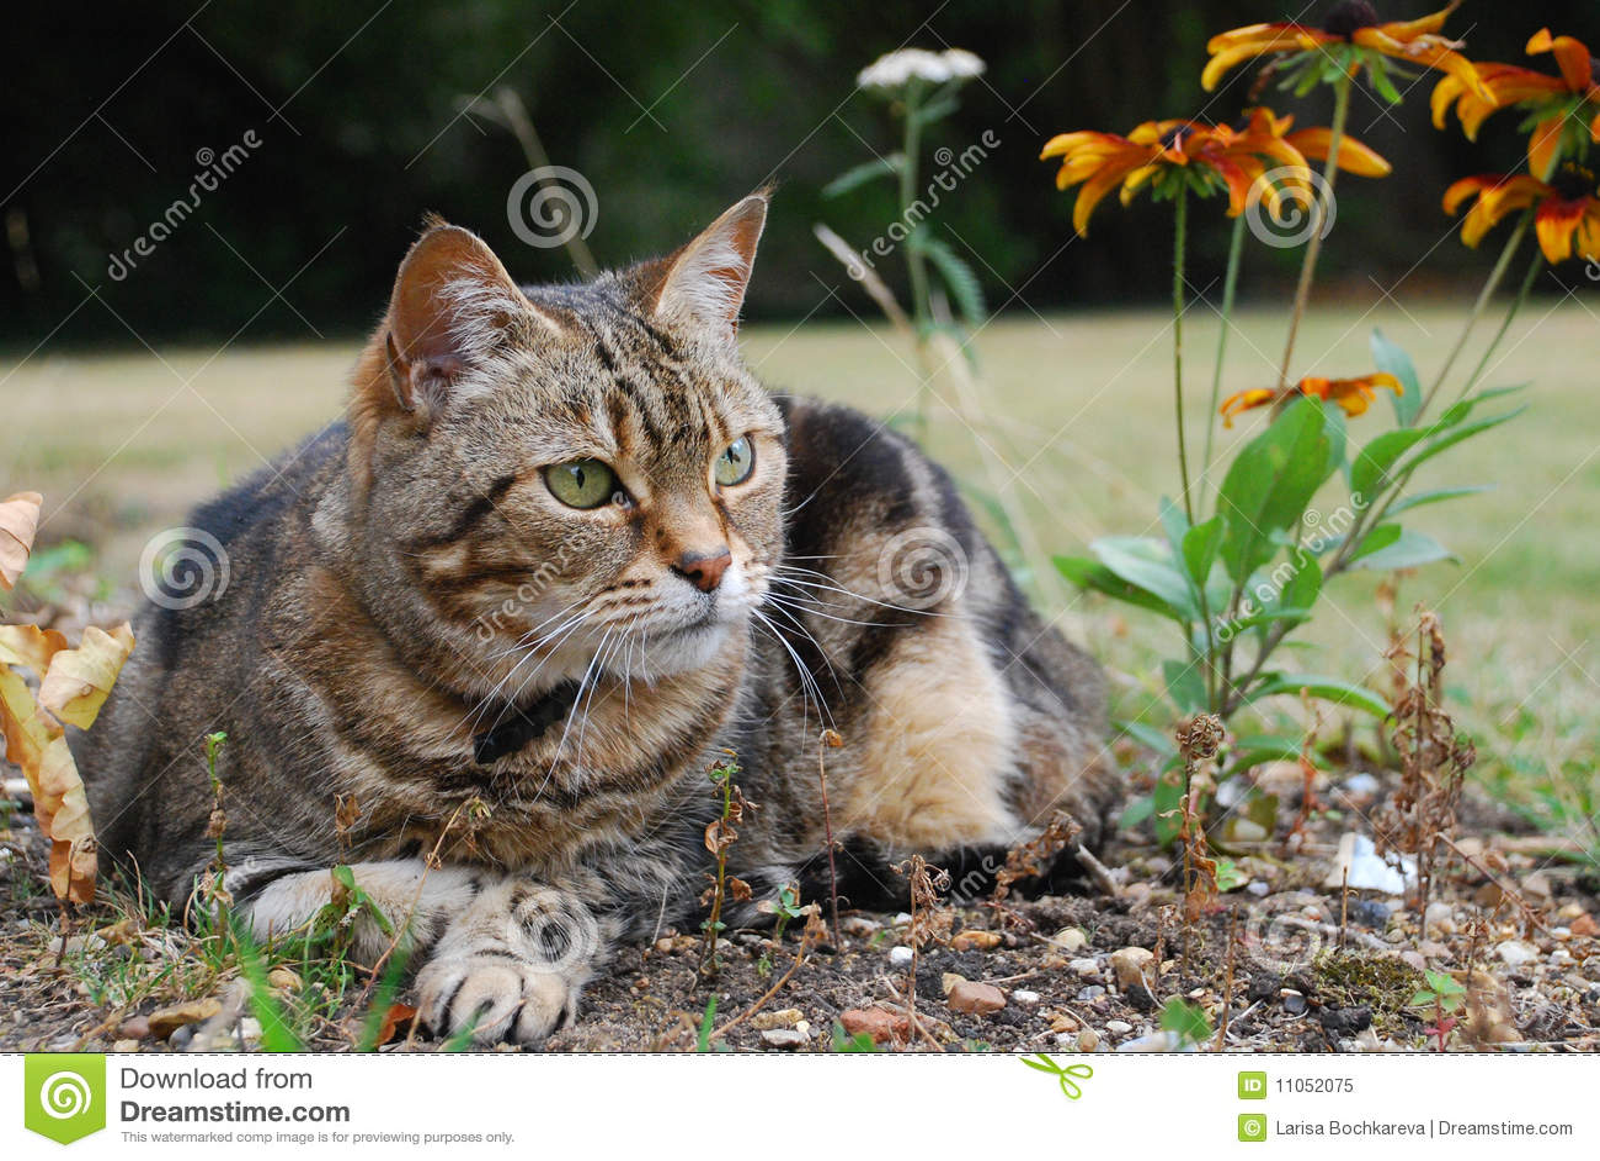 Watching Cat Close